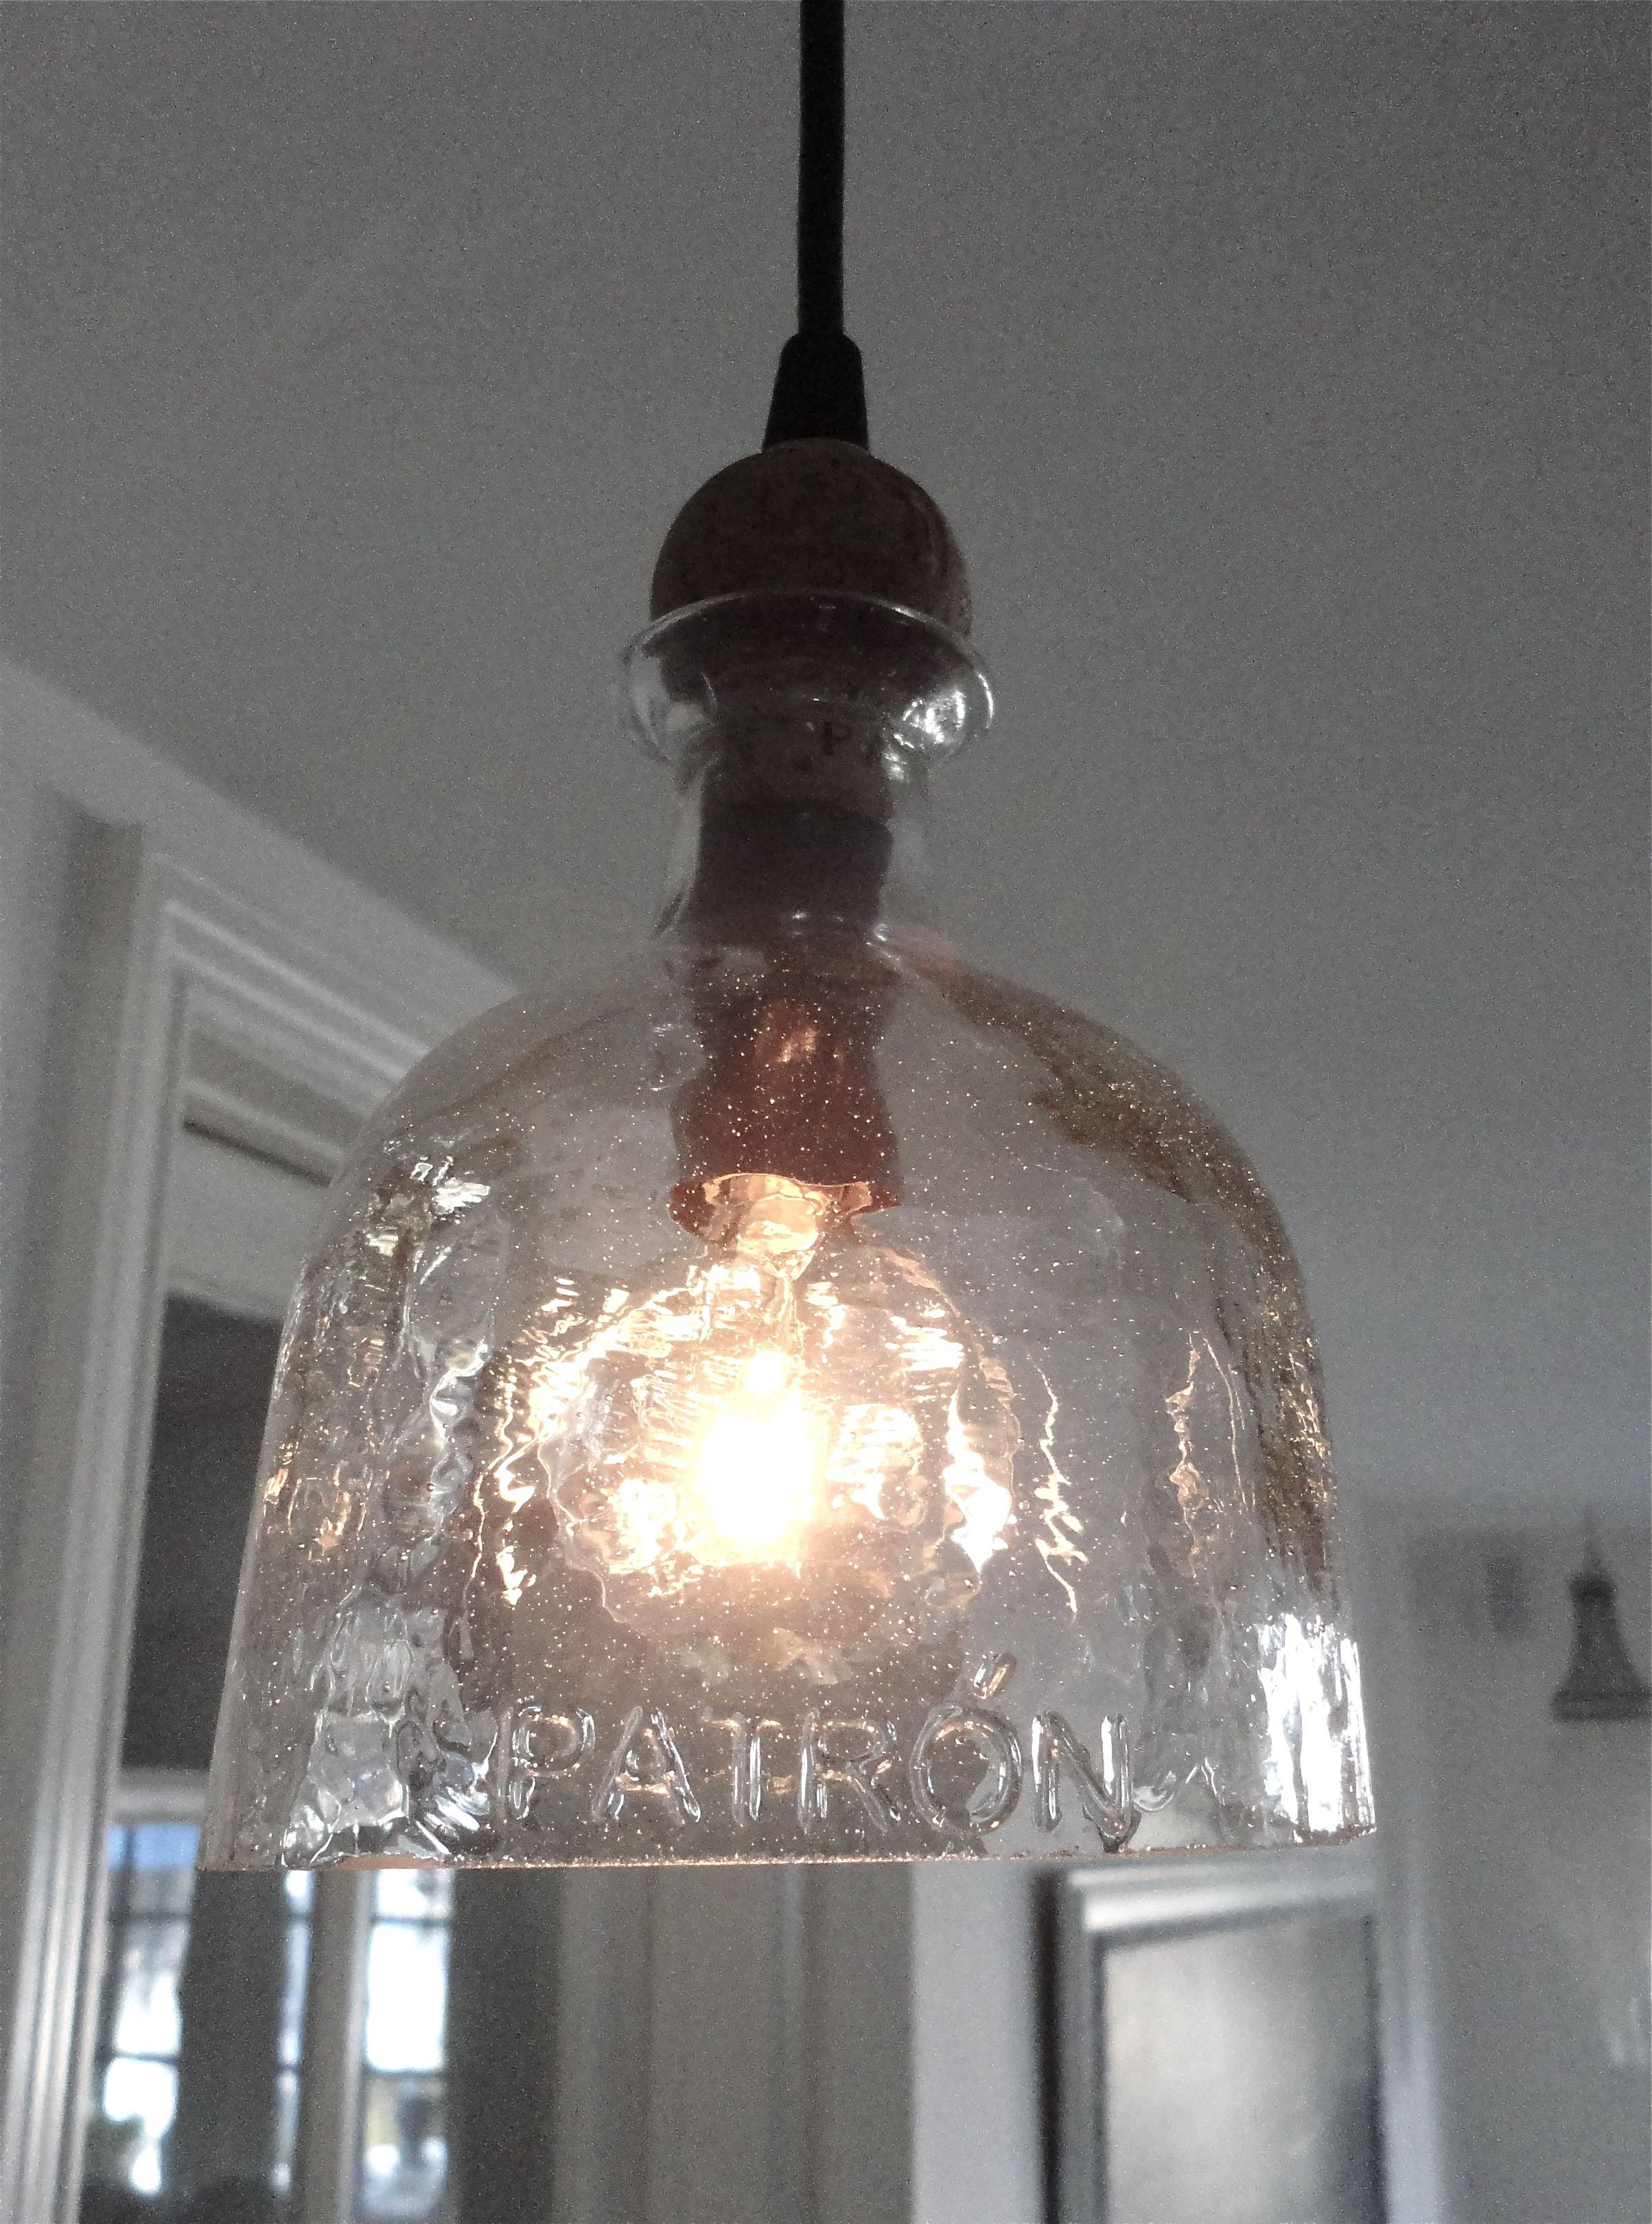 Patron Bottle Hanging Light Pendant Pretty Cool Next On My To - Basement light fixture